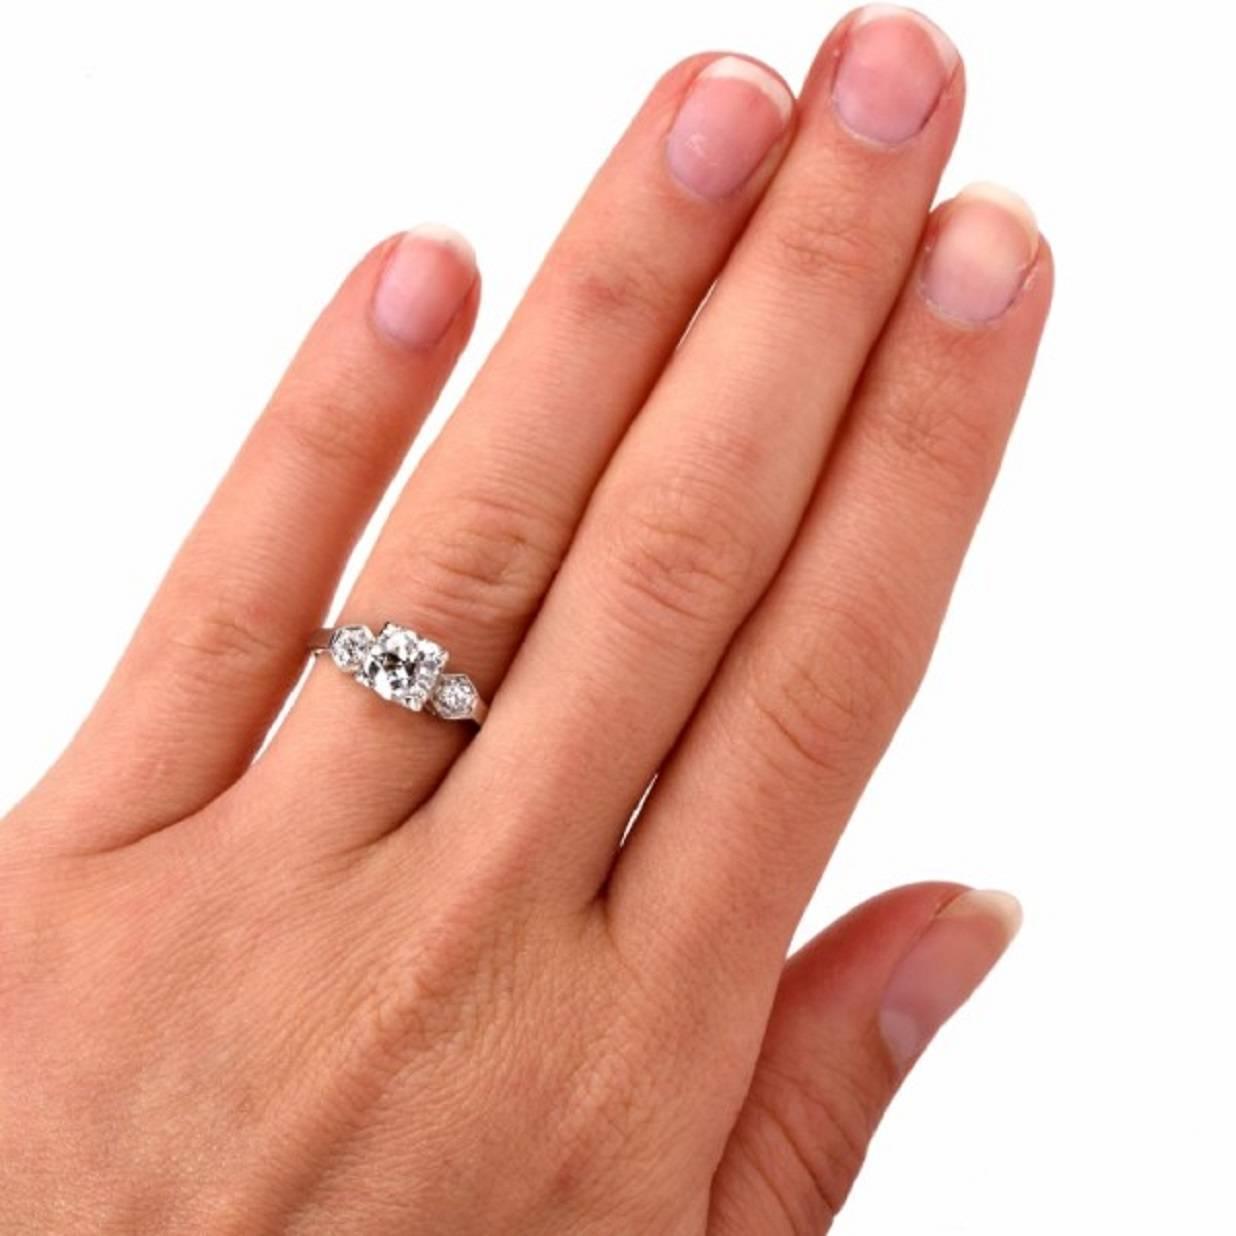 115 Carat European Cut Diamond Gold Engagement Ring At. Marquee Engagement Rings. Name Engraved Rings. Non Traditional Wedding Rings. Celebrity Rings. Handmade Rings. Rough Wedding Rings. Moon Rock Engagement Rings. Pdf Engagement Rings